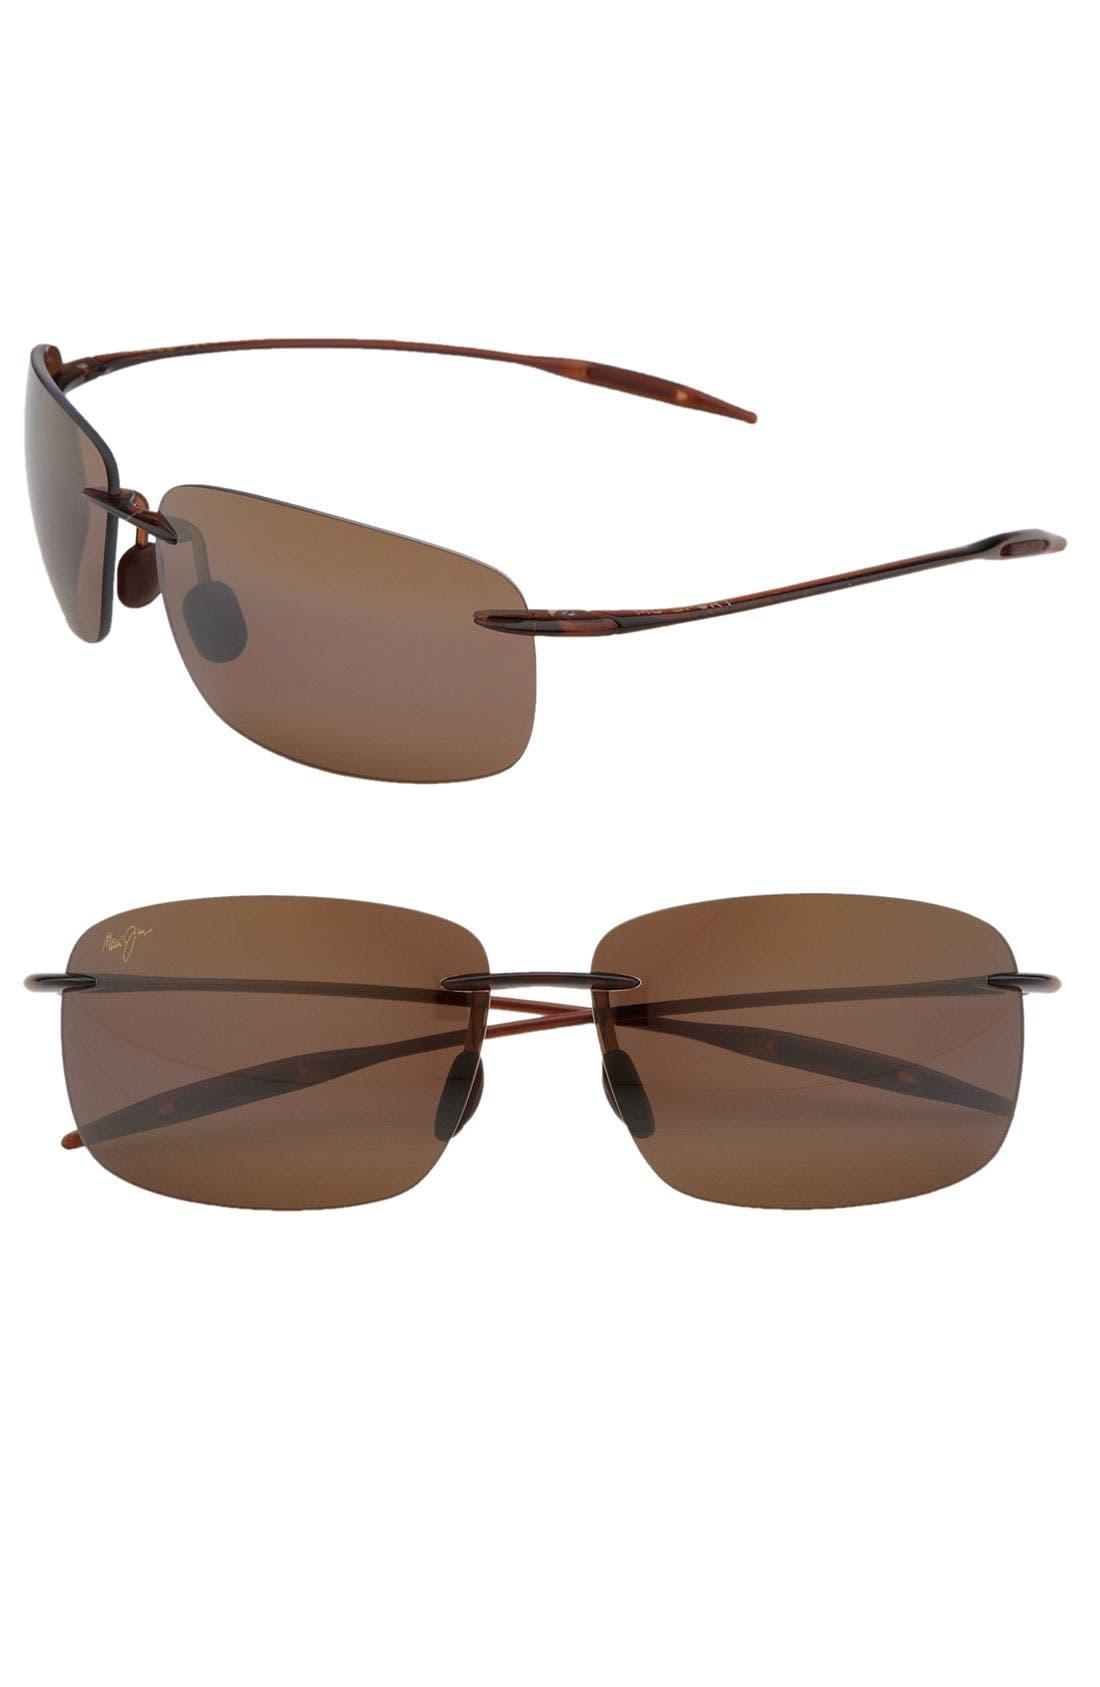 Breakwall 63mm Polarizedplus2 Rimless Sunglasses